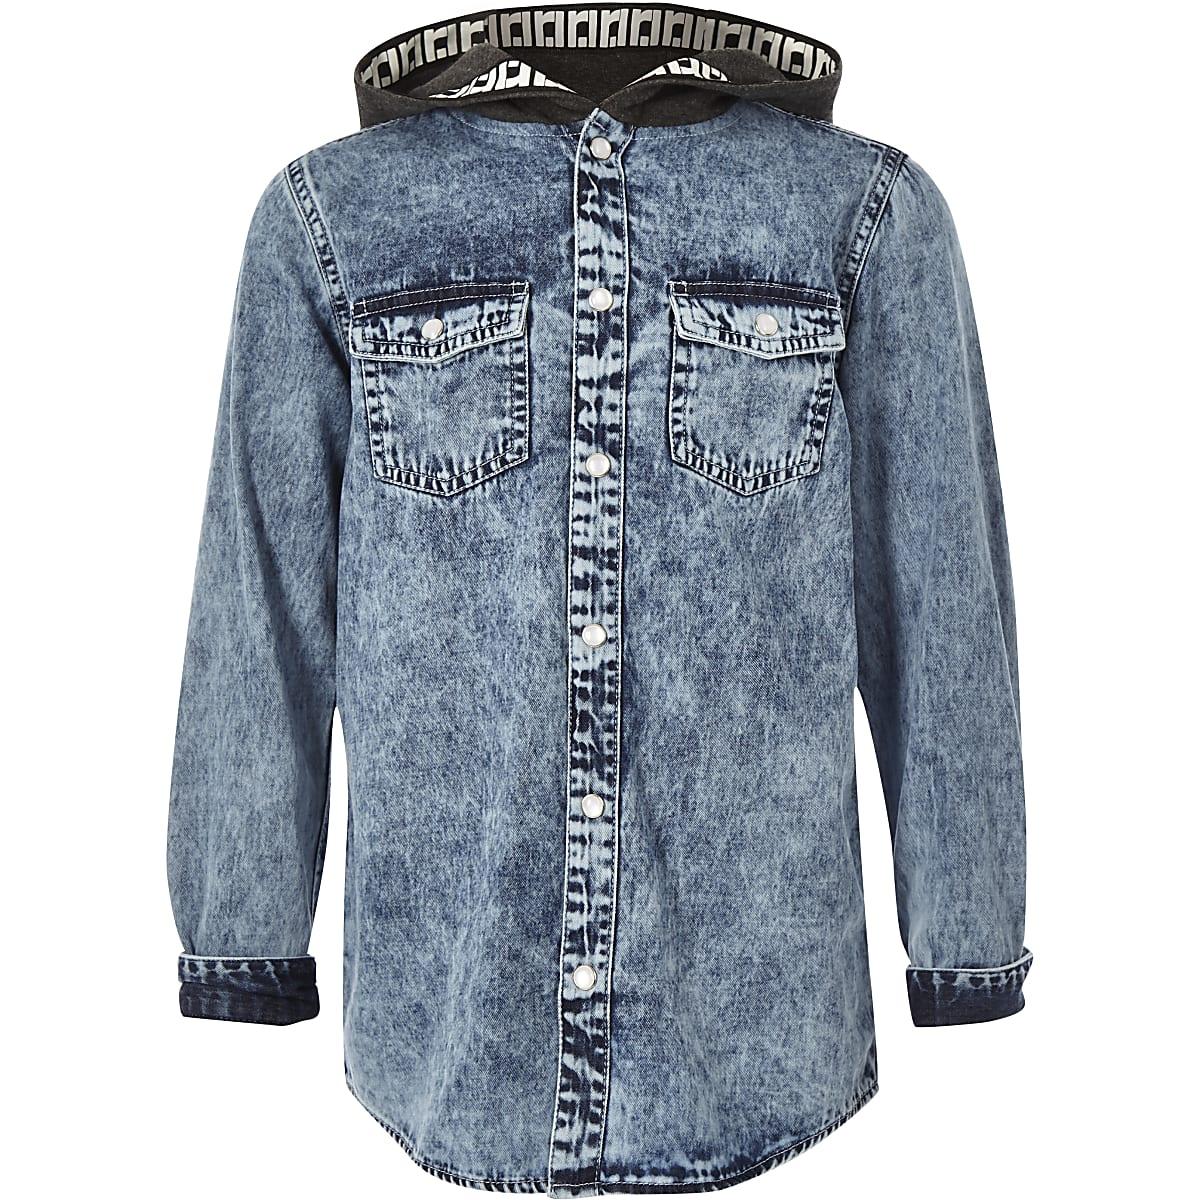 77e12a93d1e Boys blue hooded denim shirt - Long Sleeve Shirts - Shirts - boys